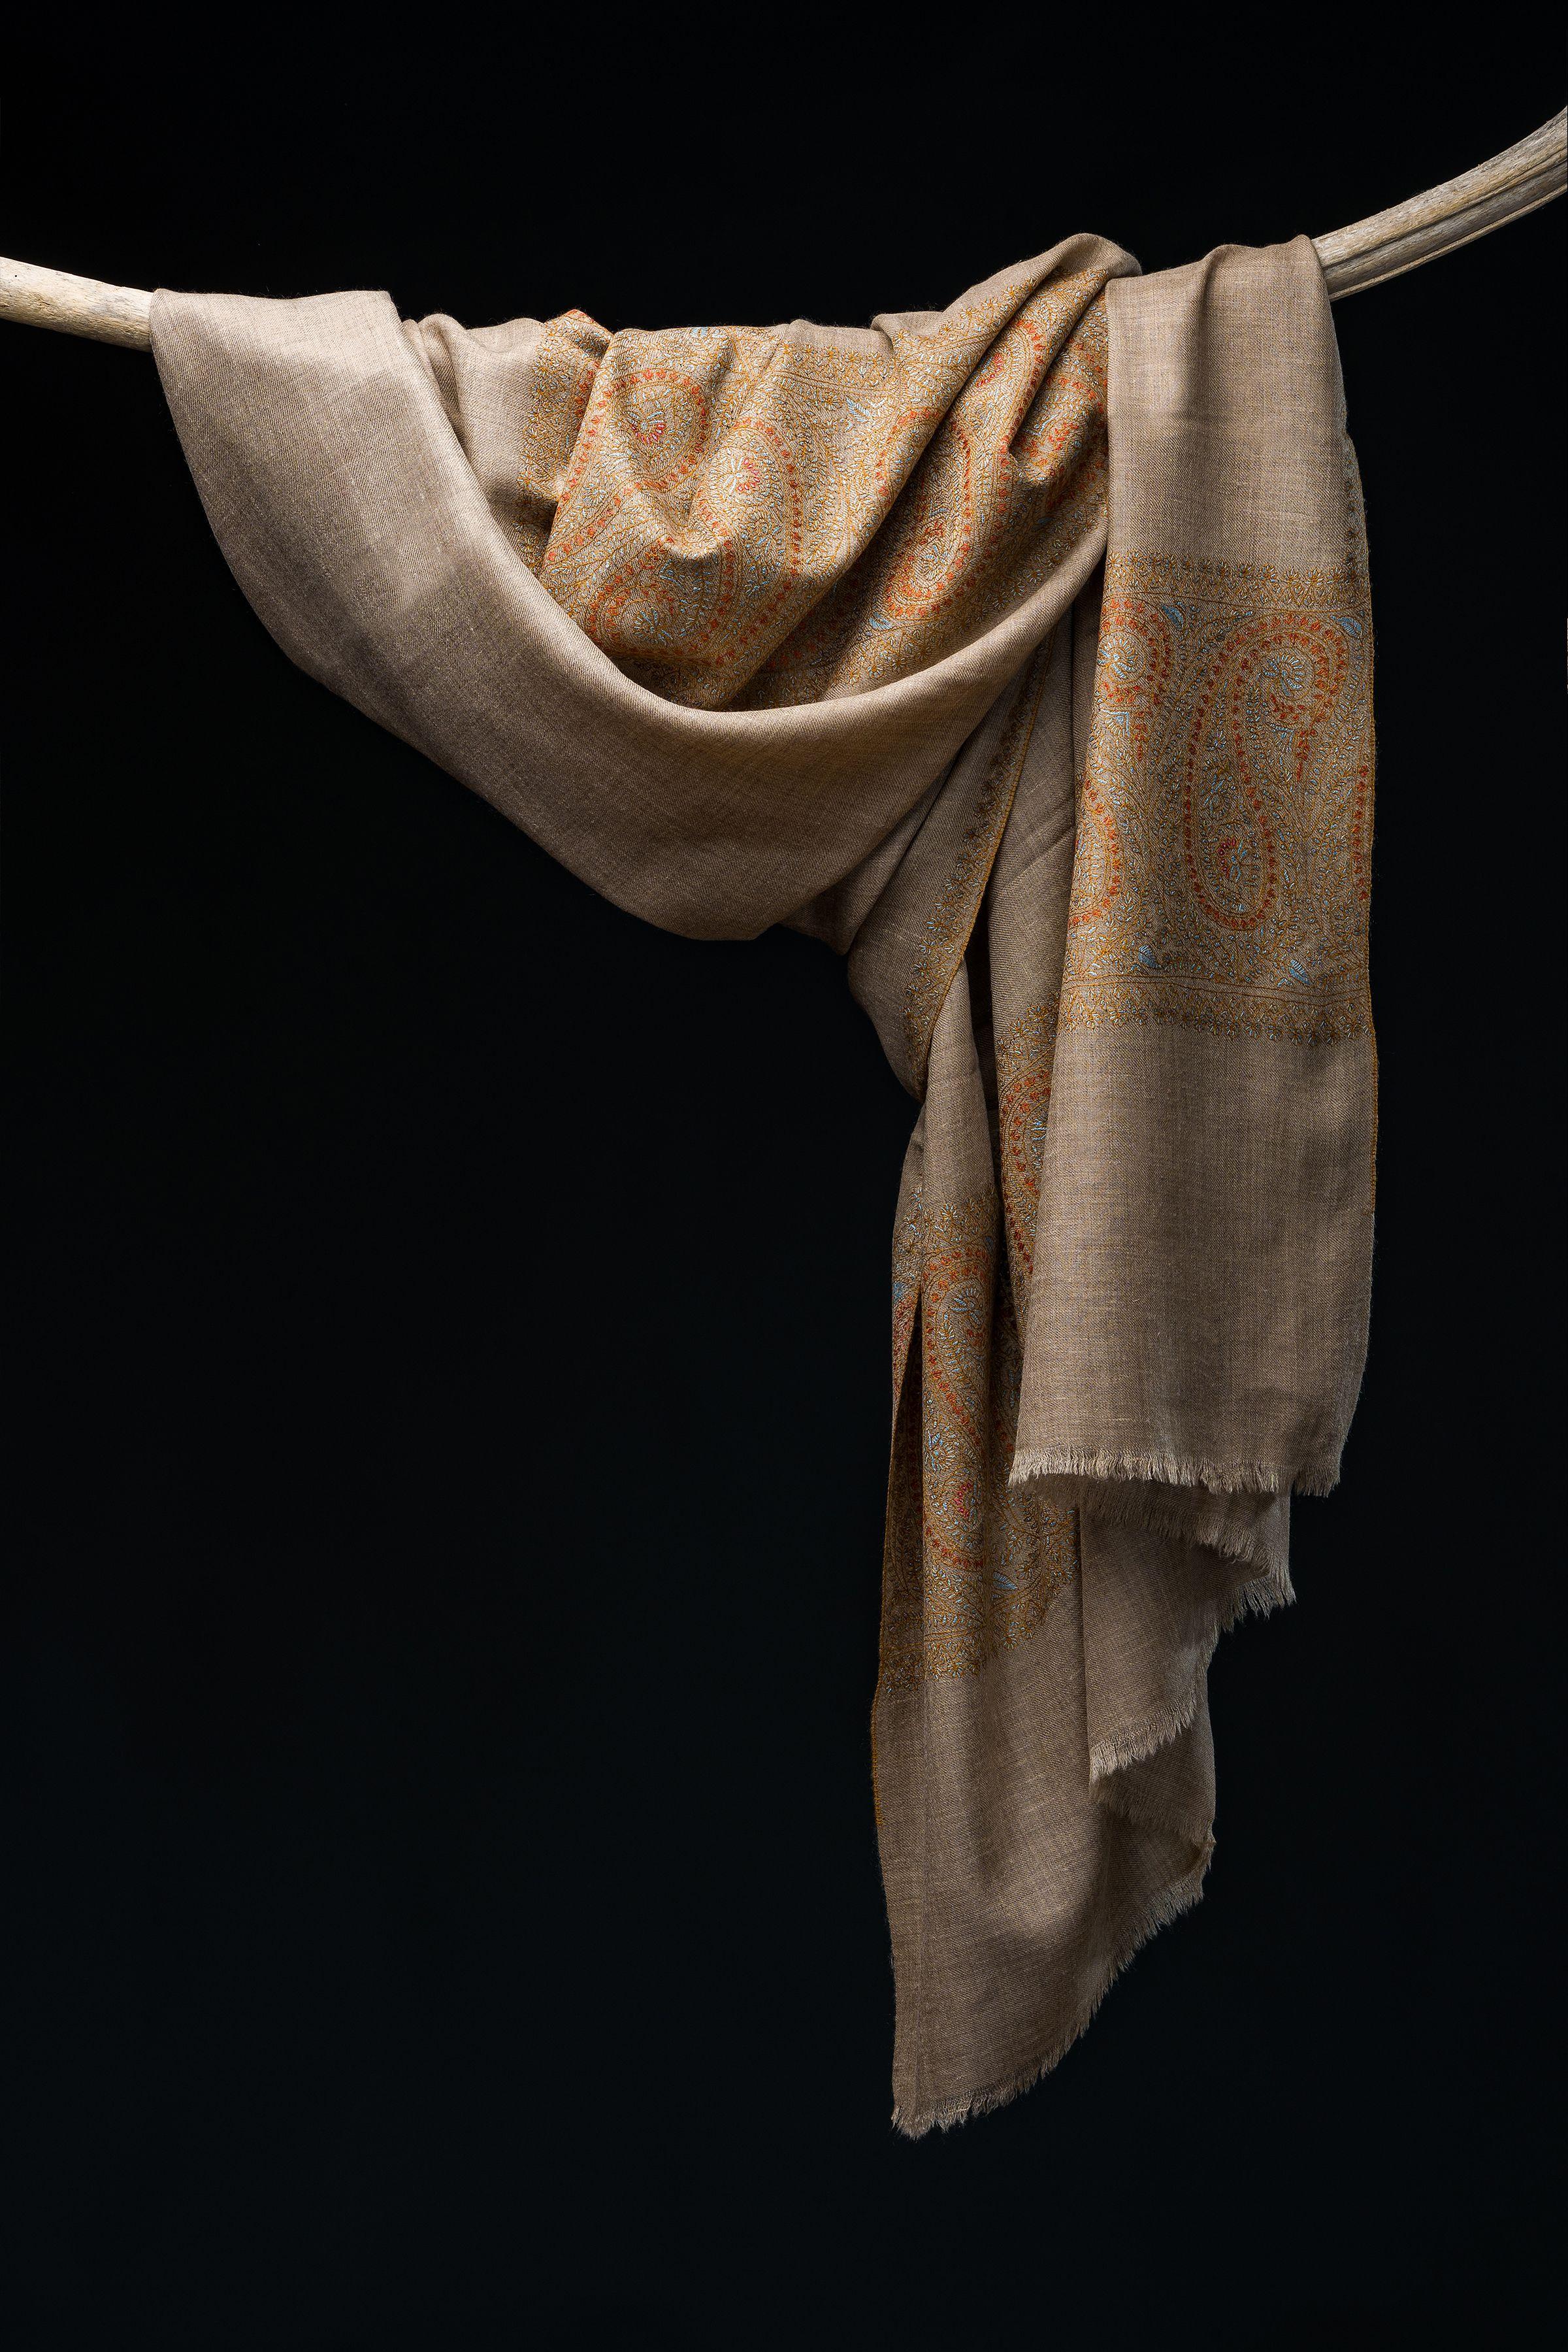 Shades Of Kashmir Sozni Palla Dar In 2020 Traditional Techniques Embroidery Design